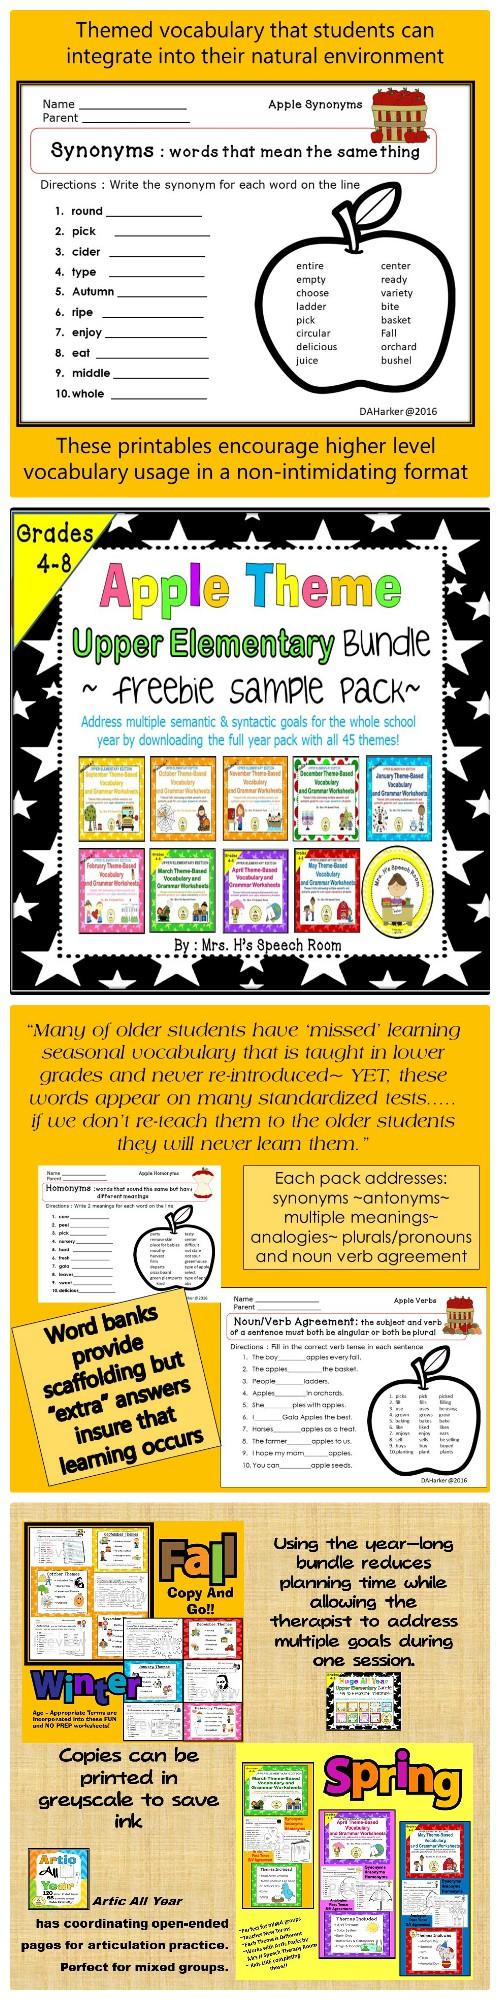 Apple Speechtherapy Upperelementary School Speech Therapy Upper Elementary Grammar Worksheets [ 2000 x 500 Pixel ]